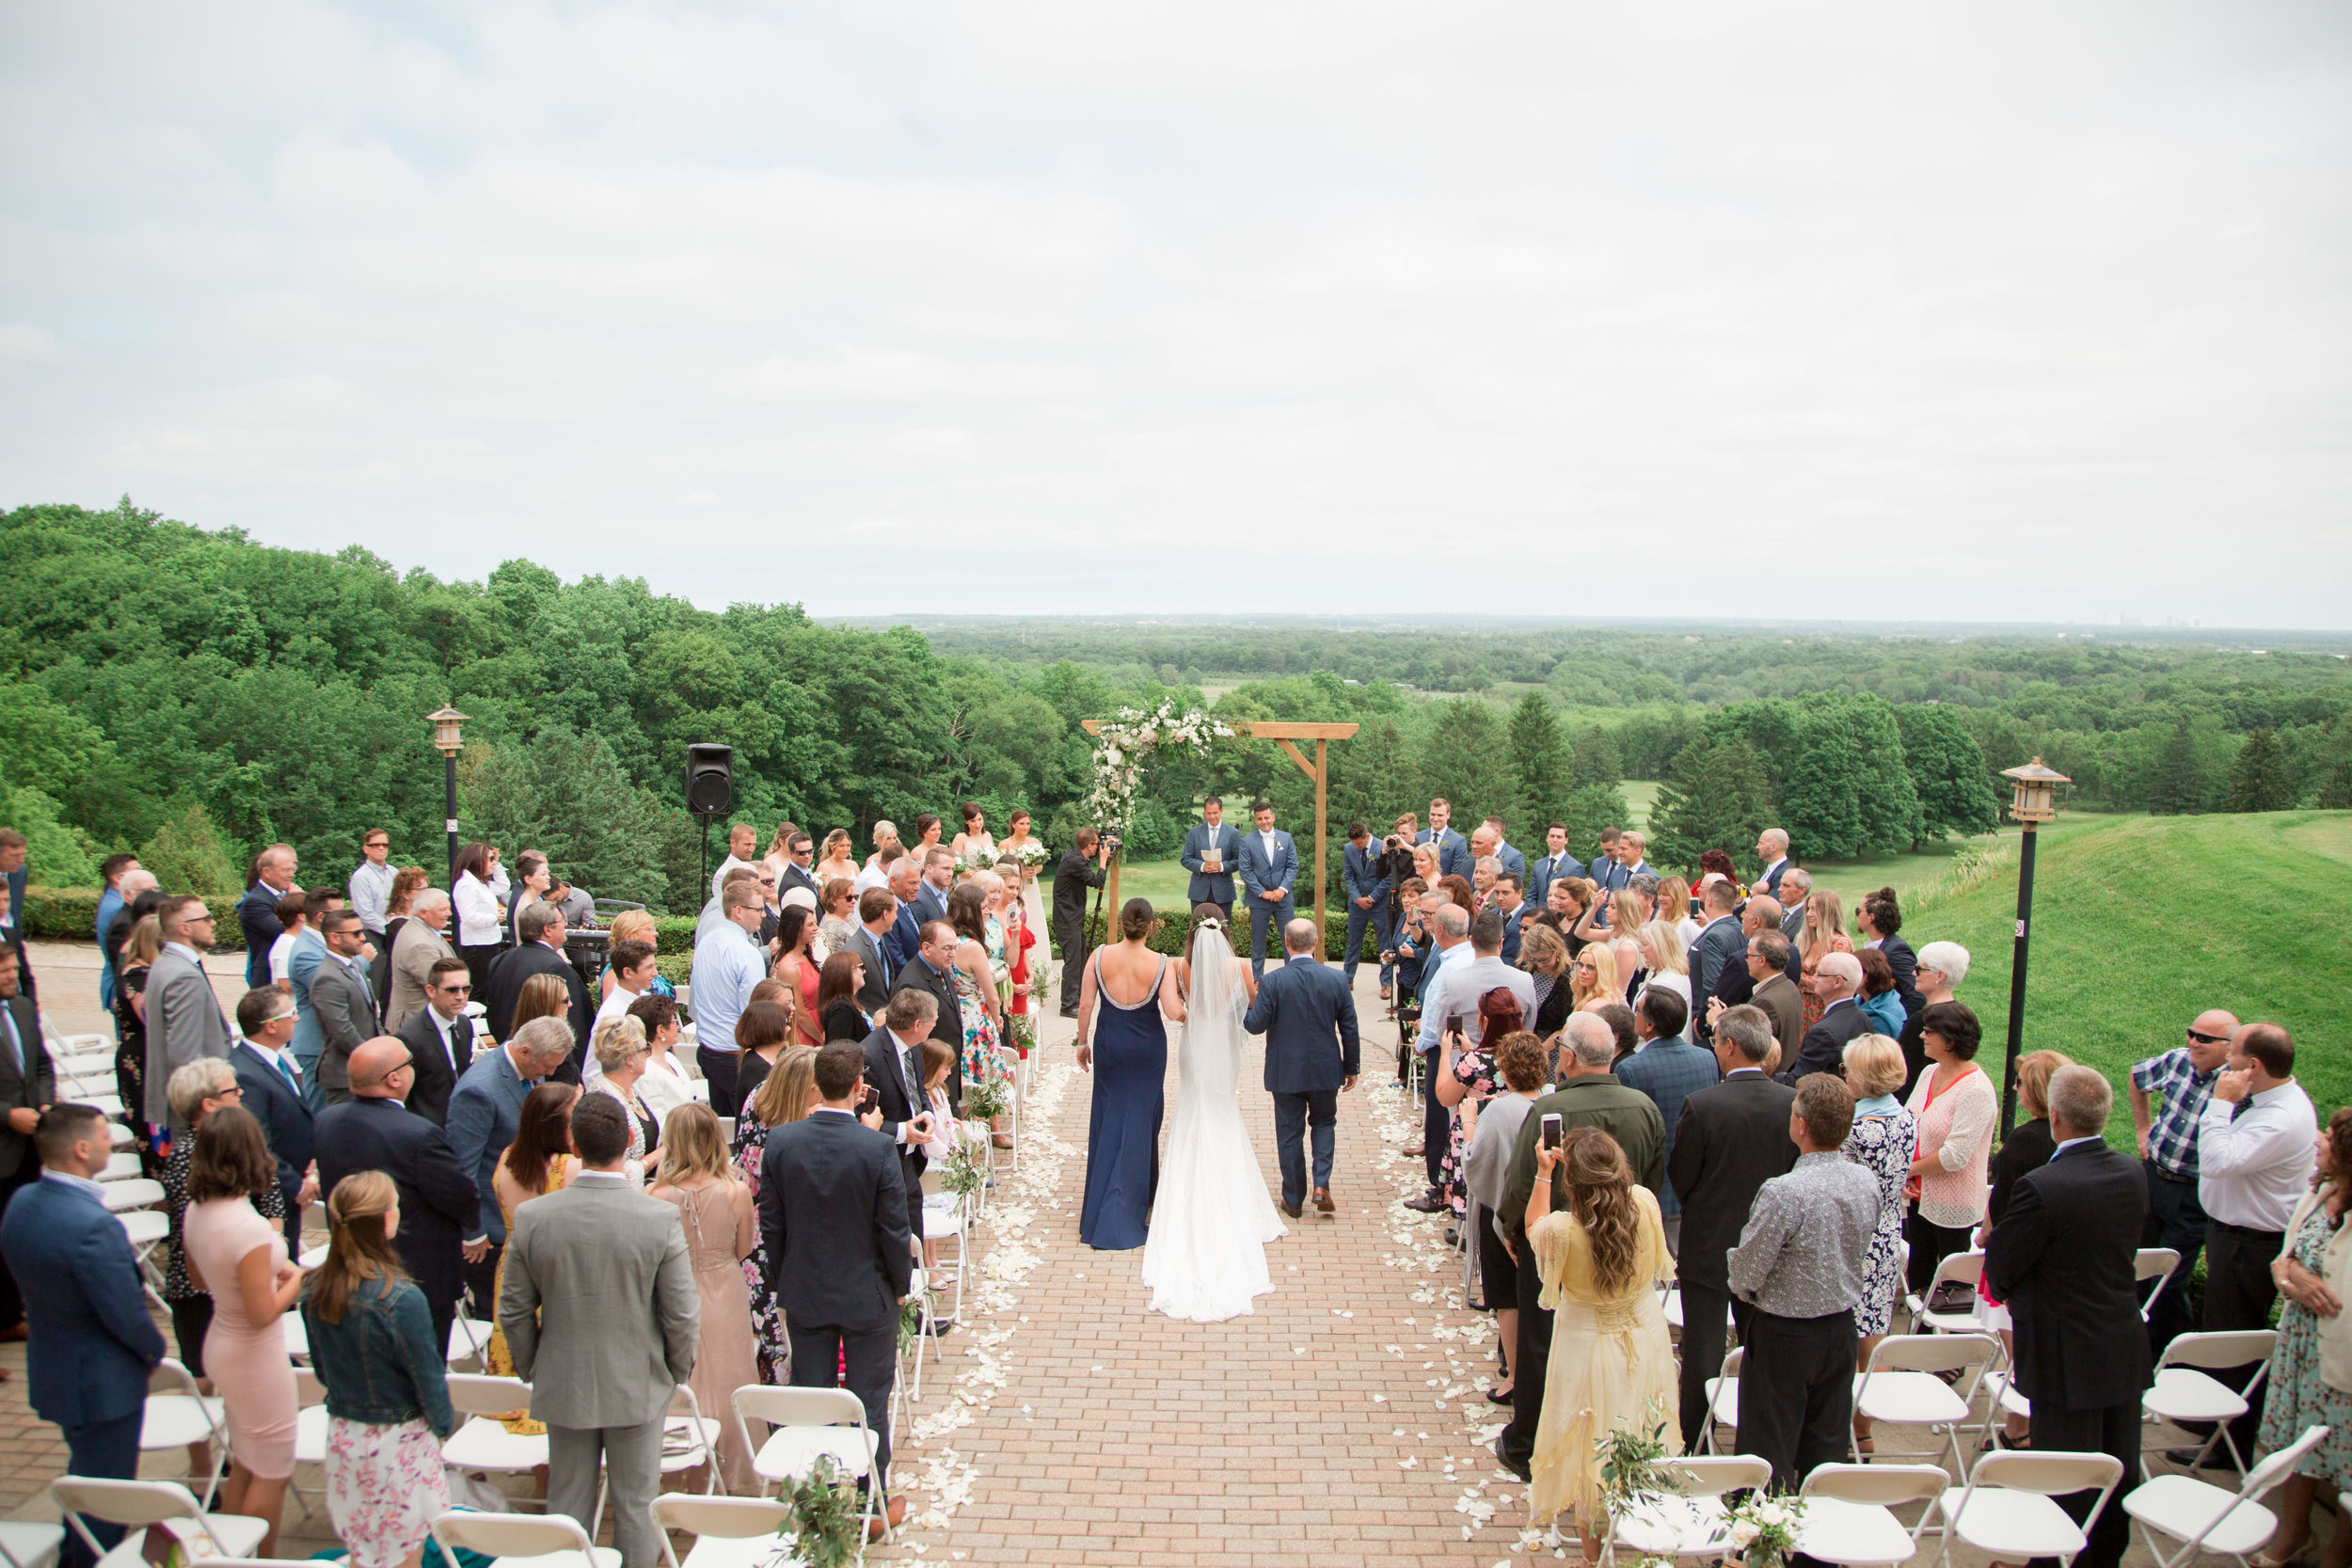 Miranda___Daniel___Daniel_Ricci_Weddings___High_Res._Finals_94.jpg